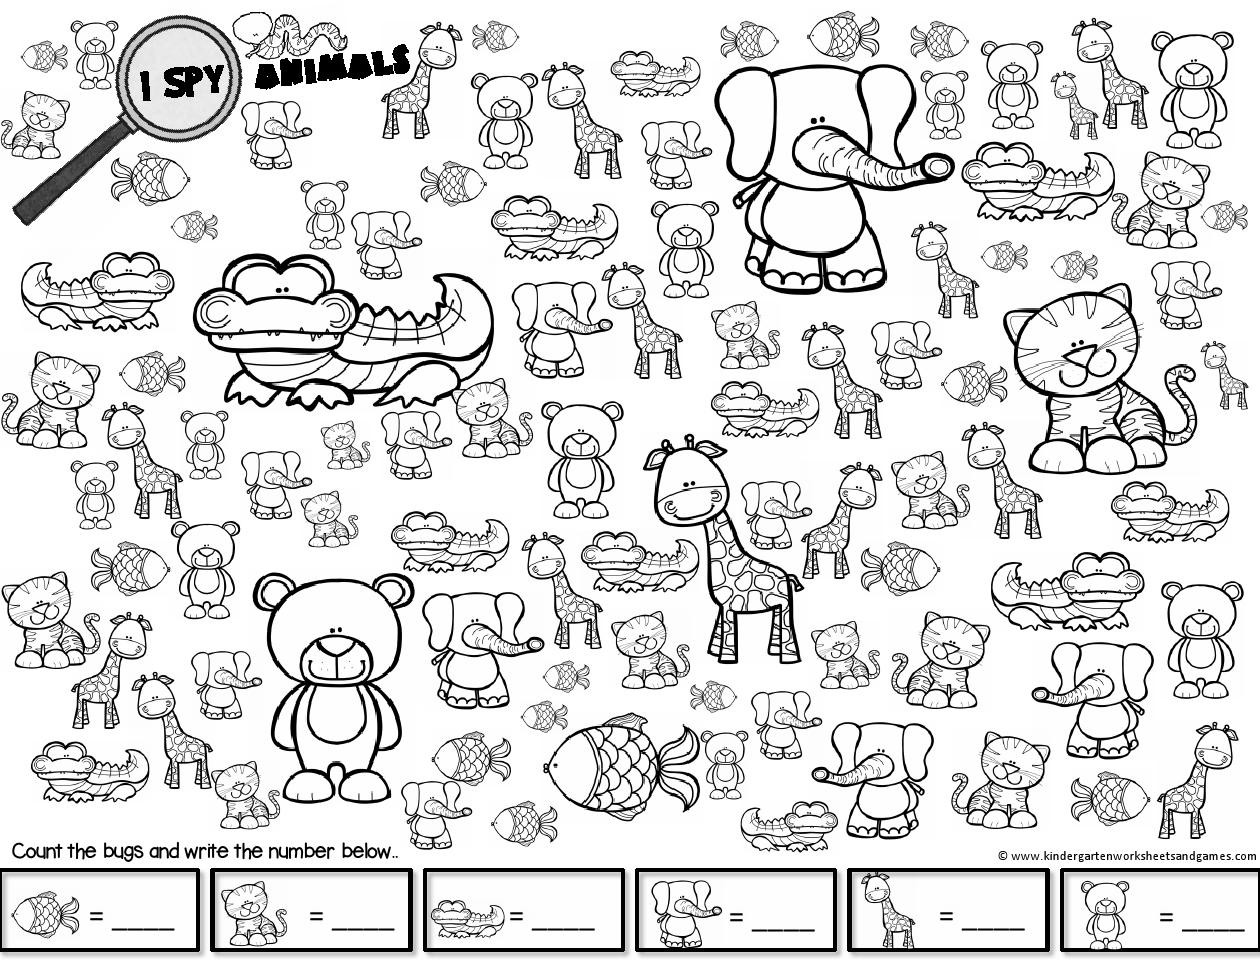 Spy Animals Spy Farm Animals Worksheet For Kindergarten Animal Worksheets Kindergarten Worksheets Christmas Worksheets [ 960 x 1260 Pixel ]